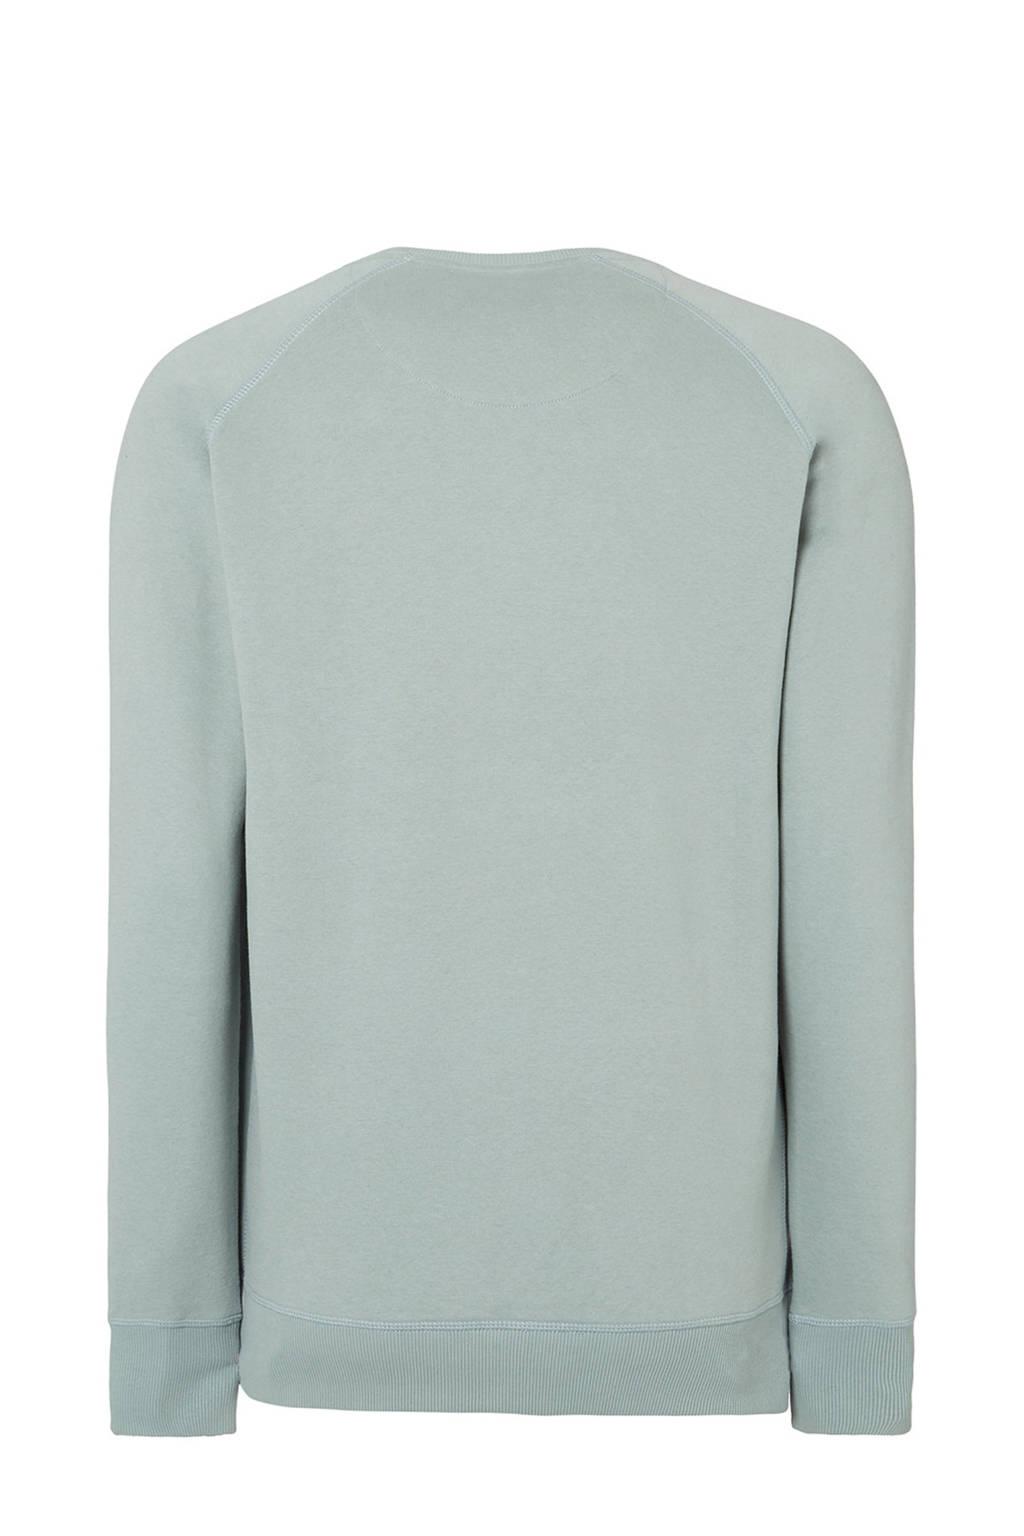 O'Neill sweater met logo sky light, Sky Light